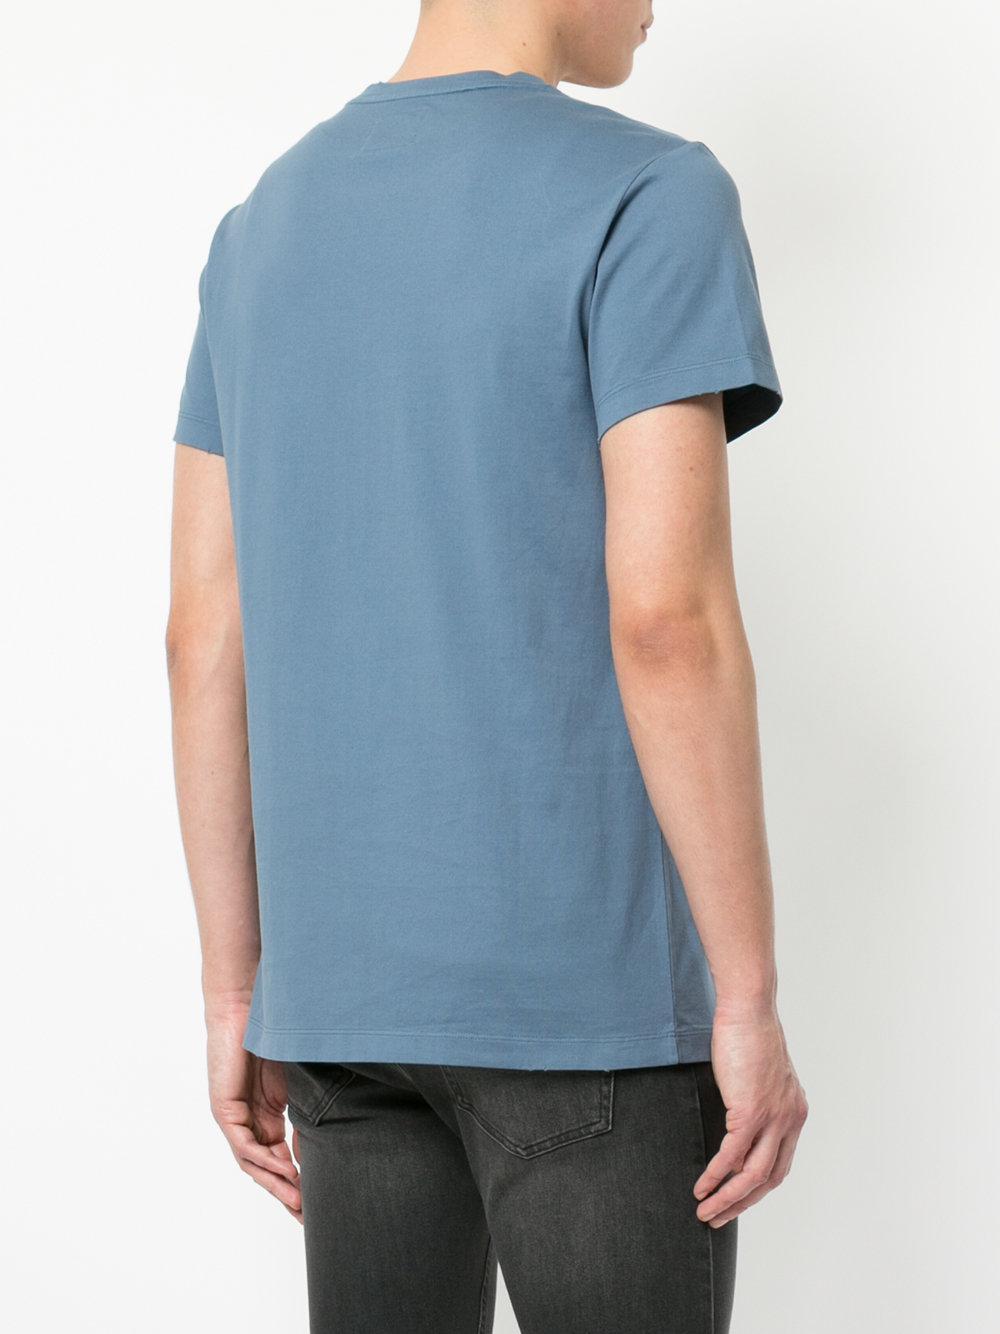 Curwen Men Crest Blue Print amp; Kent Lyst For In Shirt T Lion zE4PITq